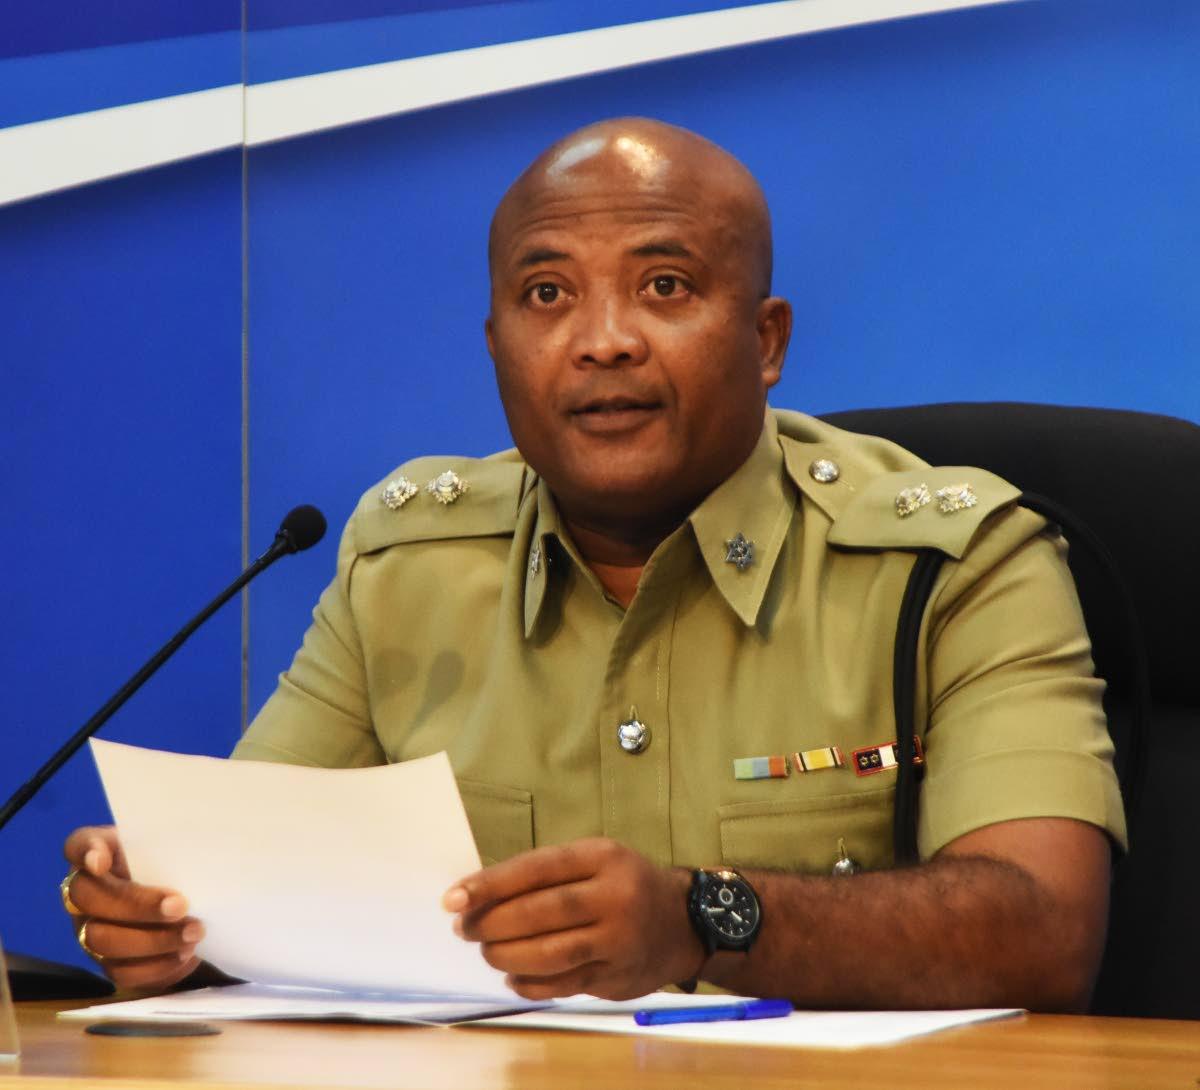 Wyane Mystar public Information Officer